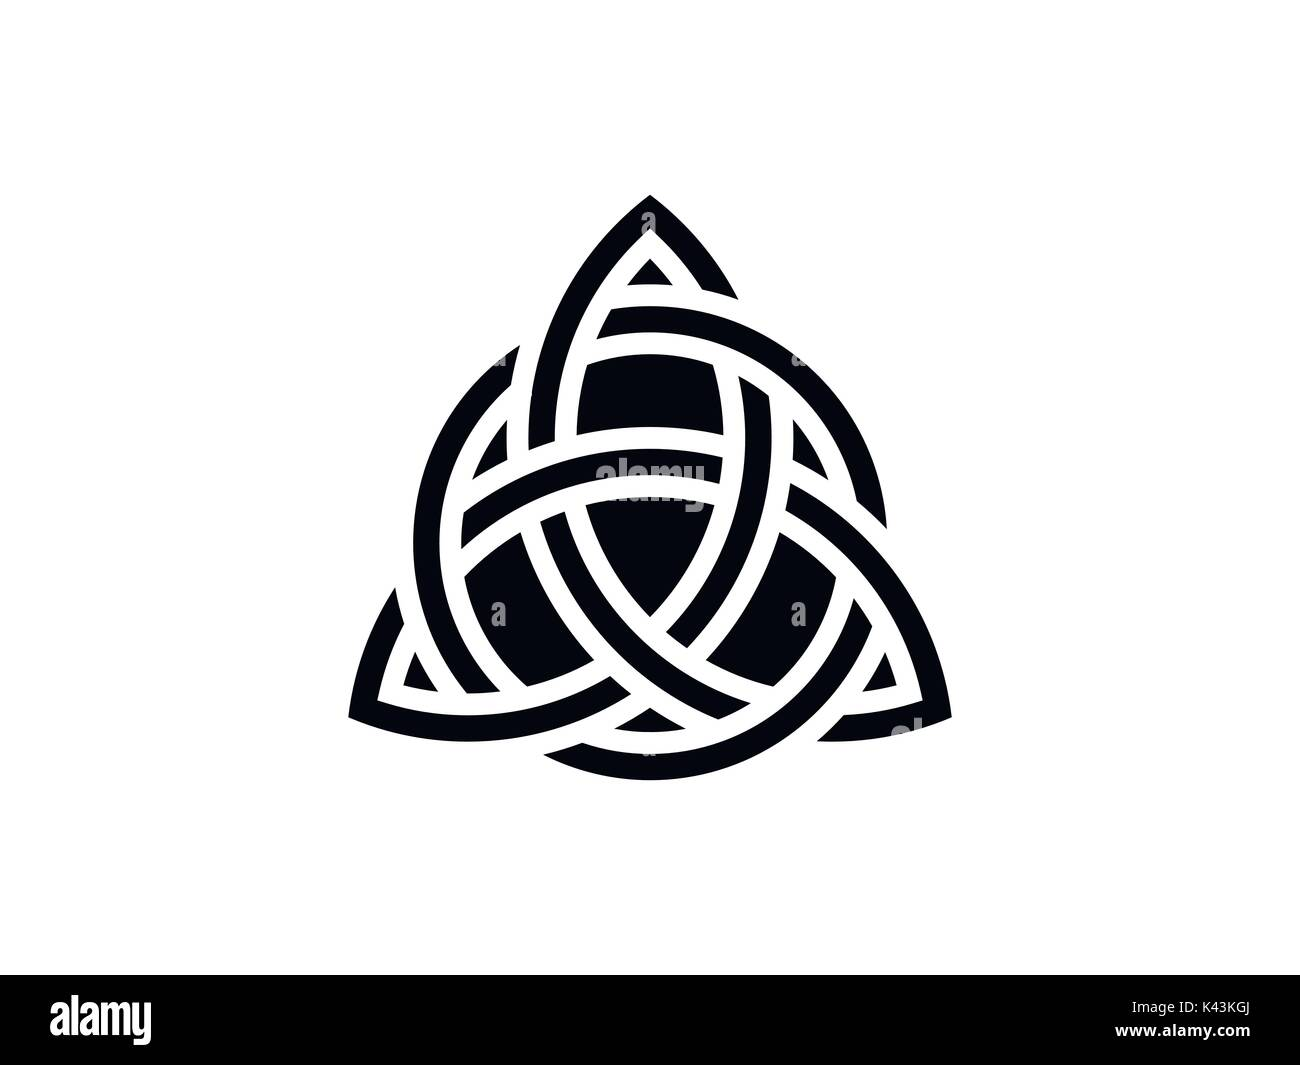 Irish celtic ornament stock photos irish celtic ornament stock trinity knot celtic symbol of eternity vector illustration stock image biocorpaavc